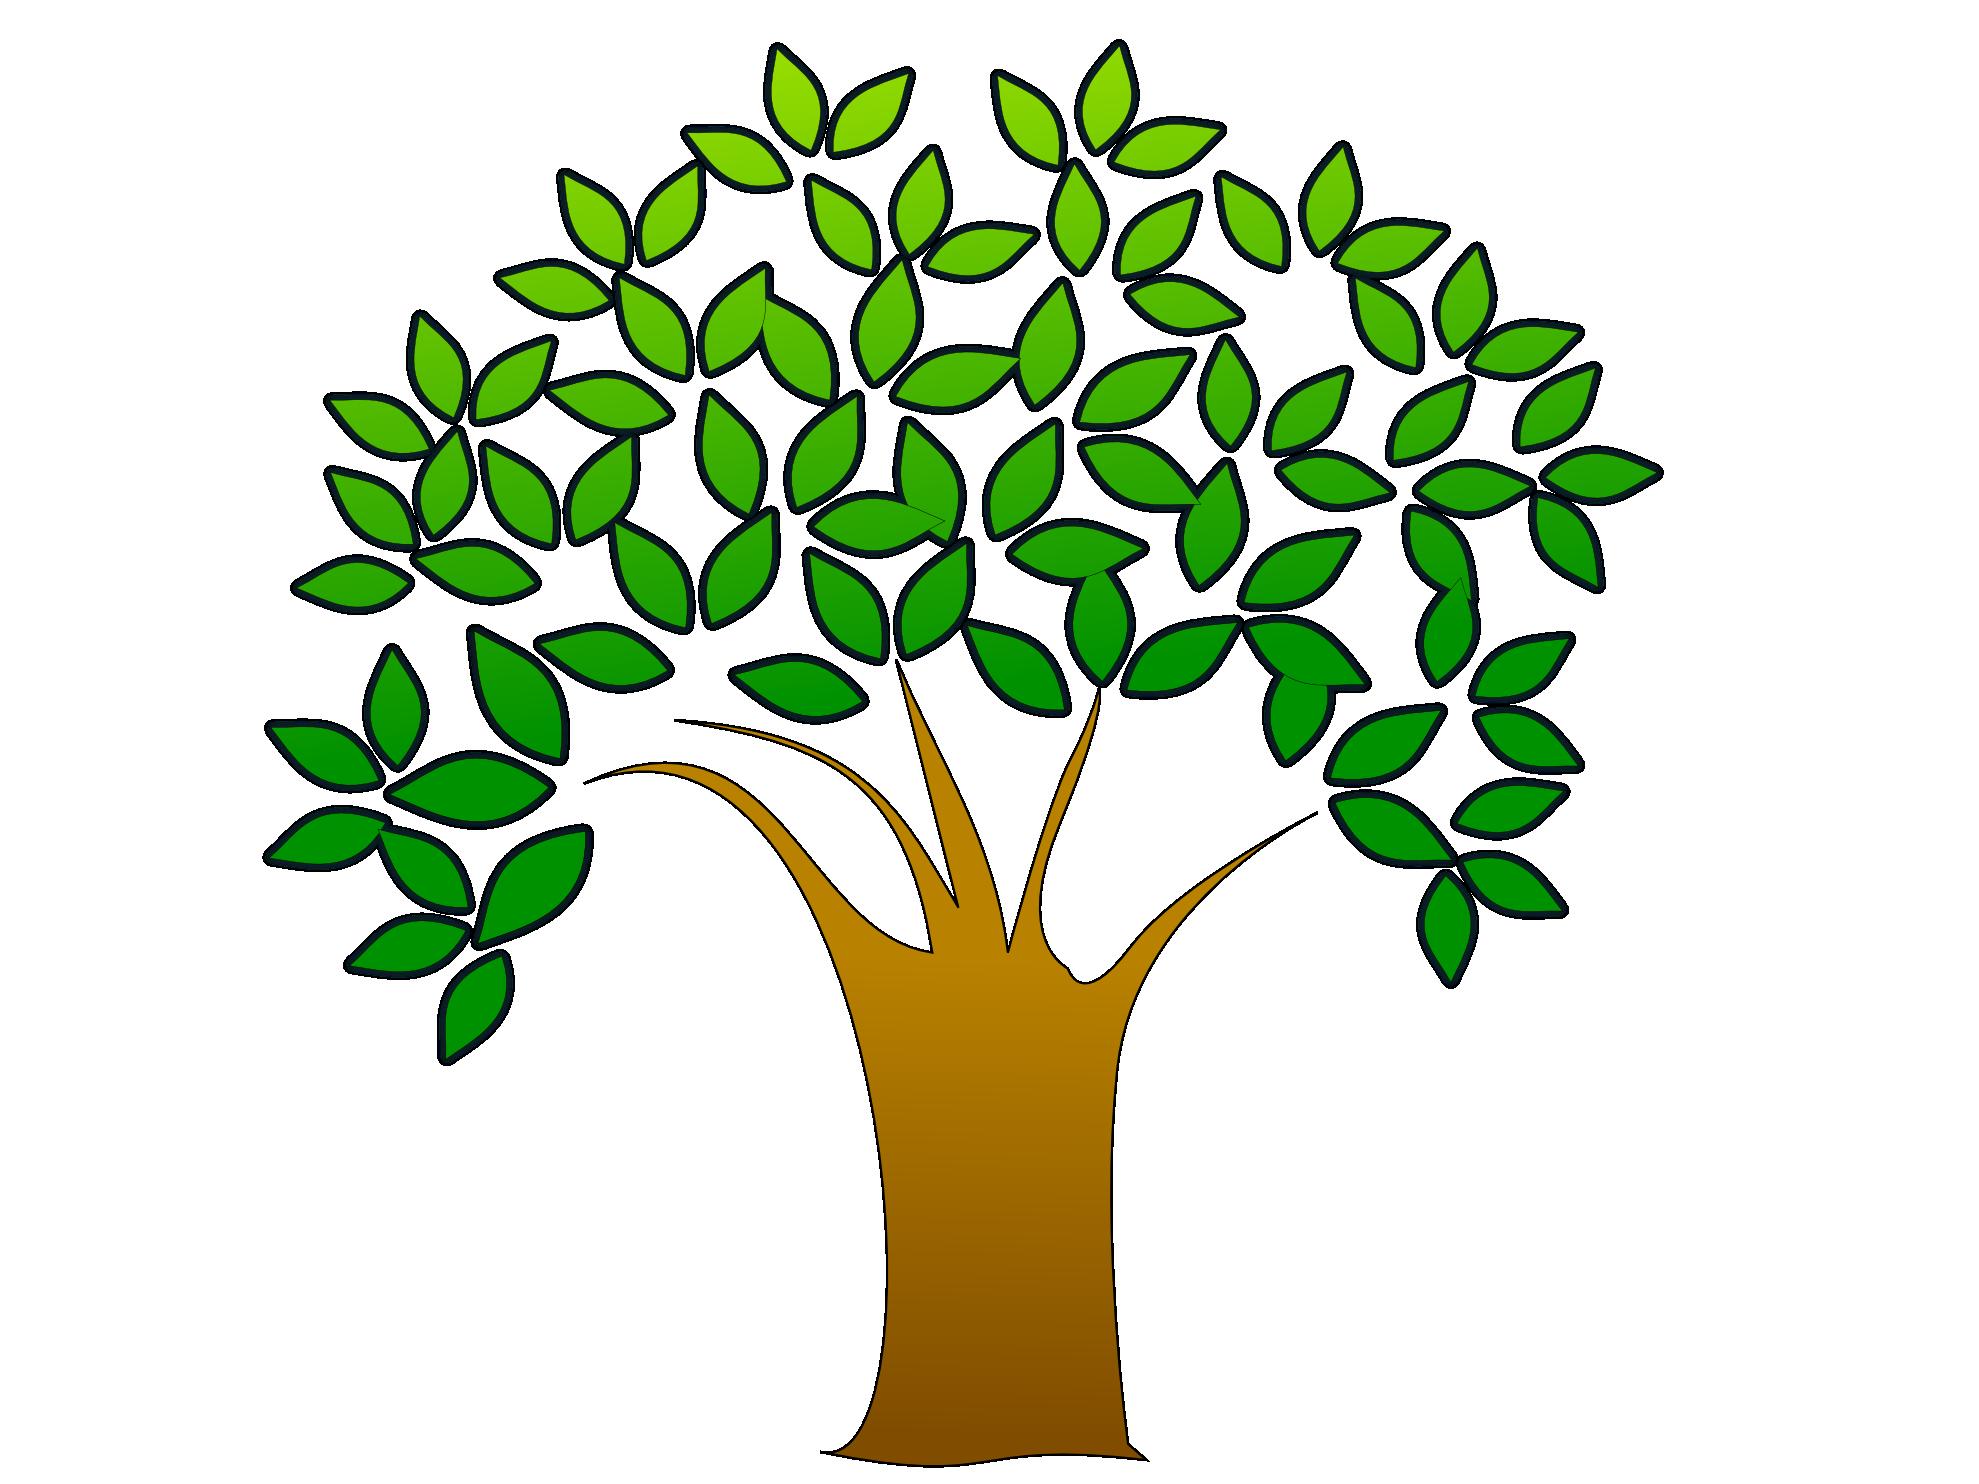 Clip Art Tree - Clipart Library-Clip Art Tree - Clipart library-1